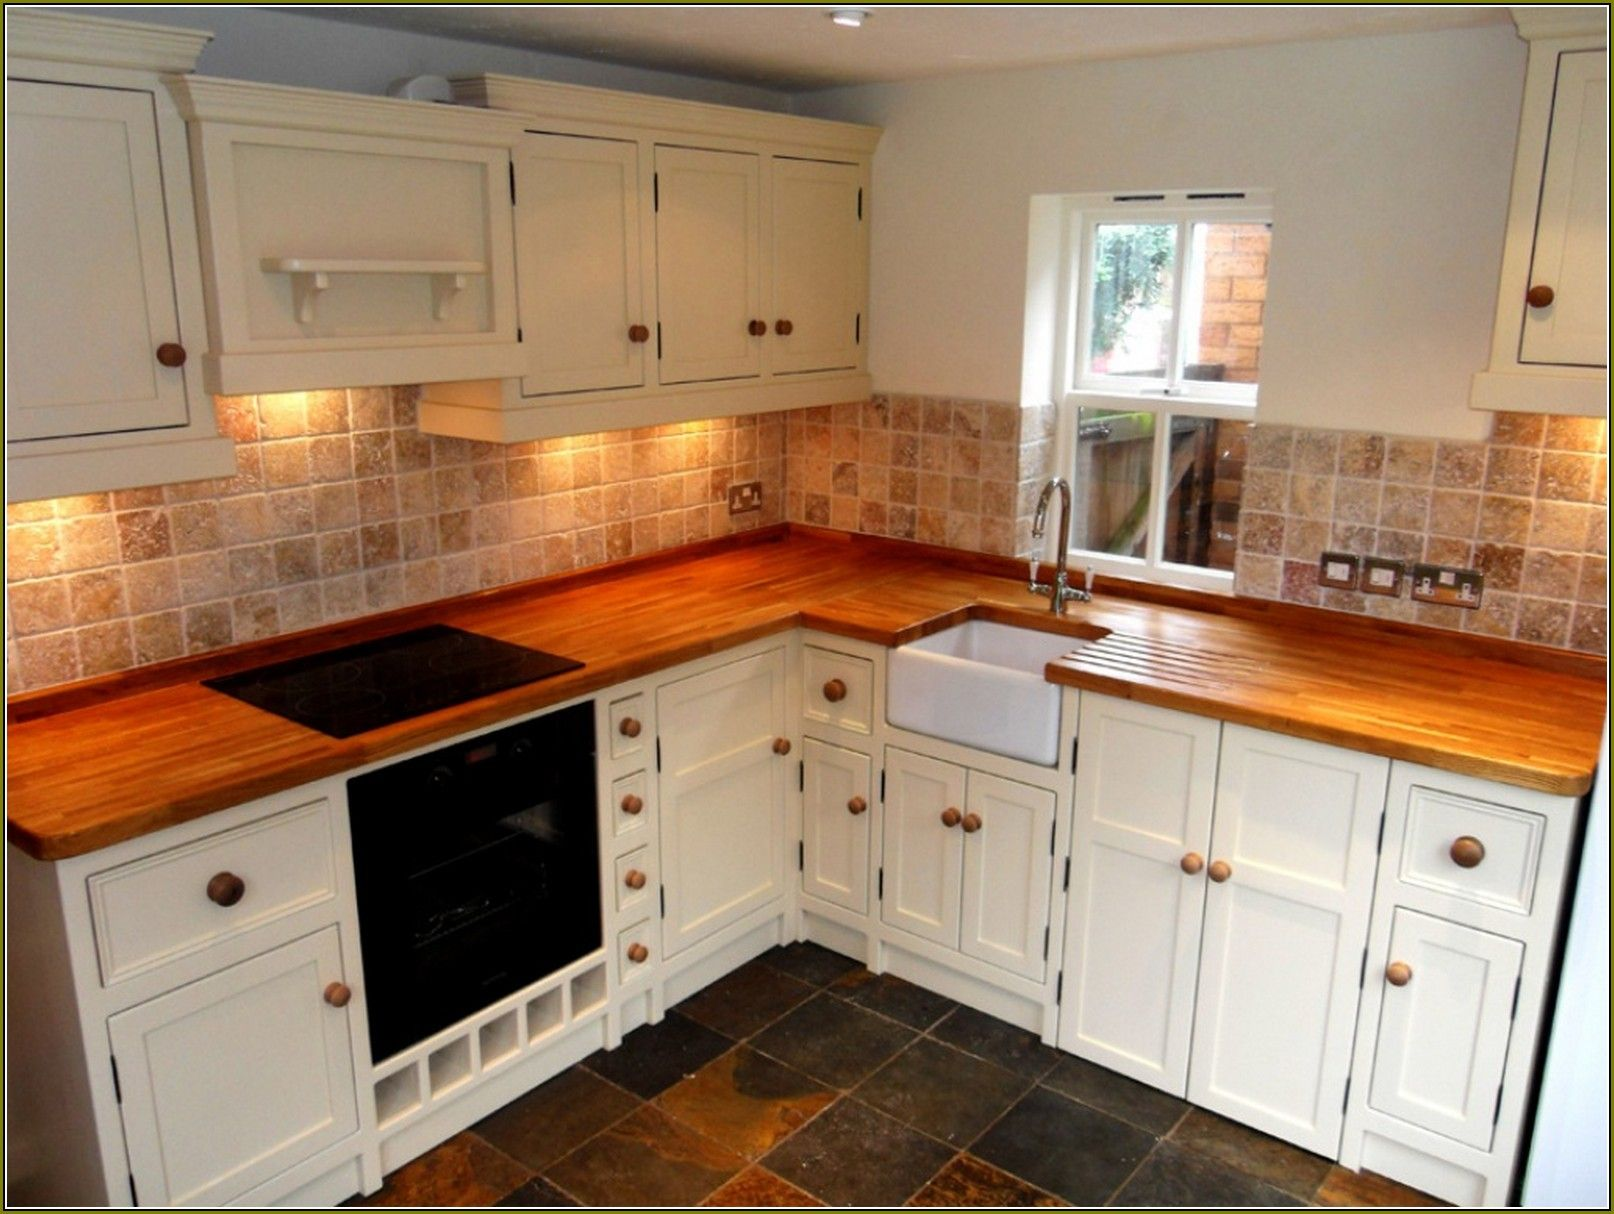 Tile Backsplash With Wood Countertop   Google Search